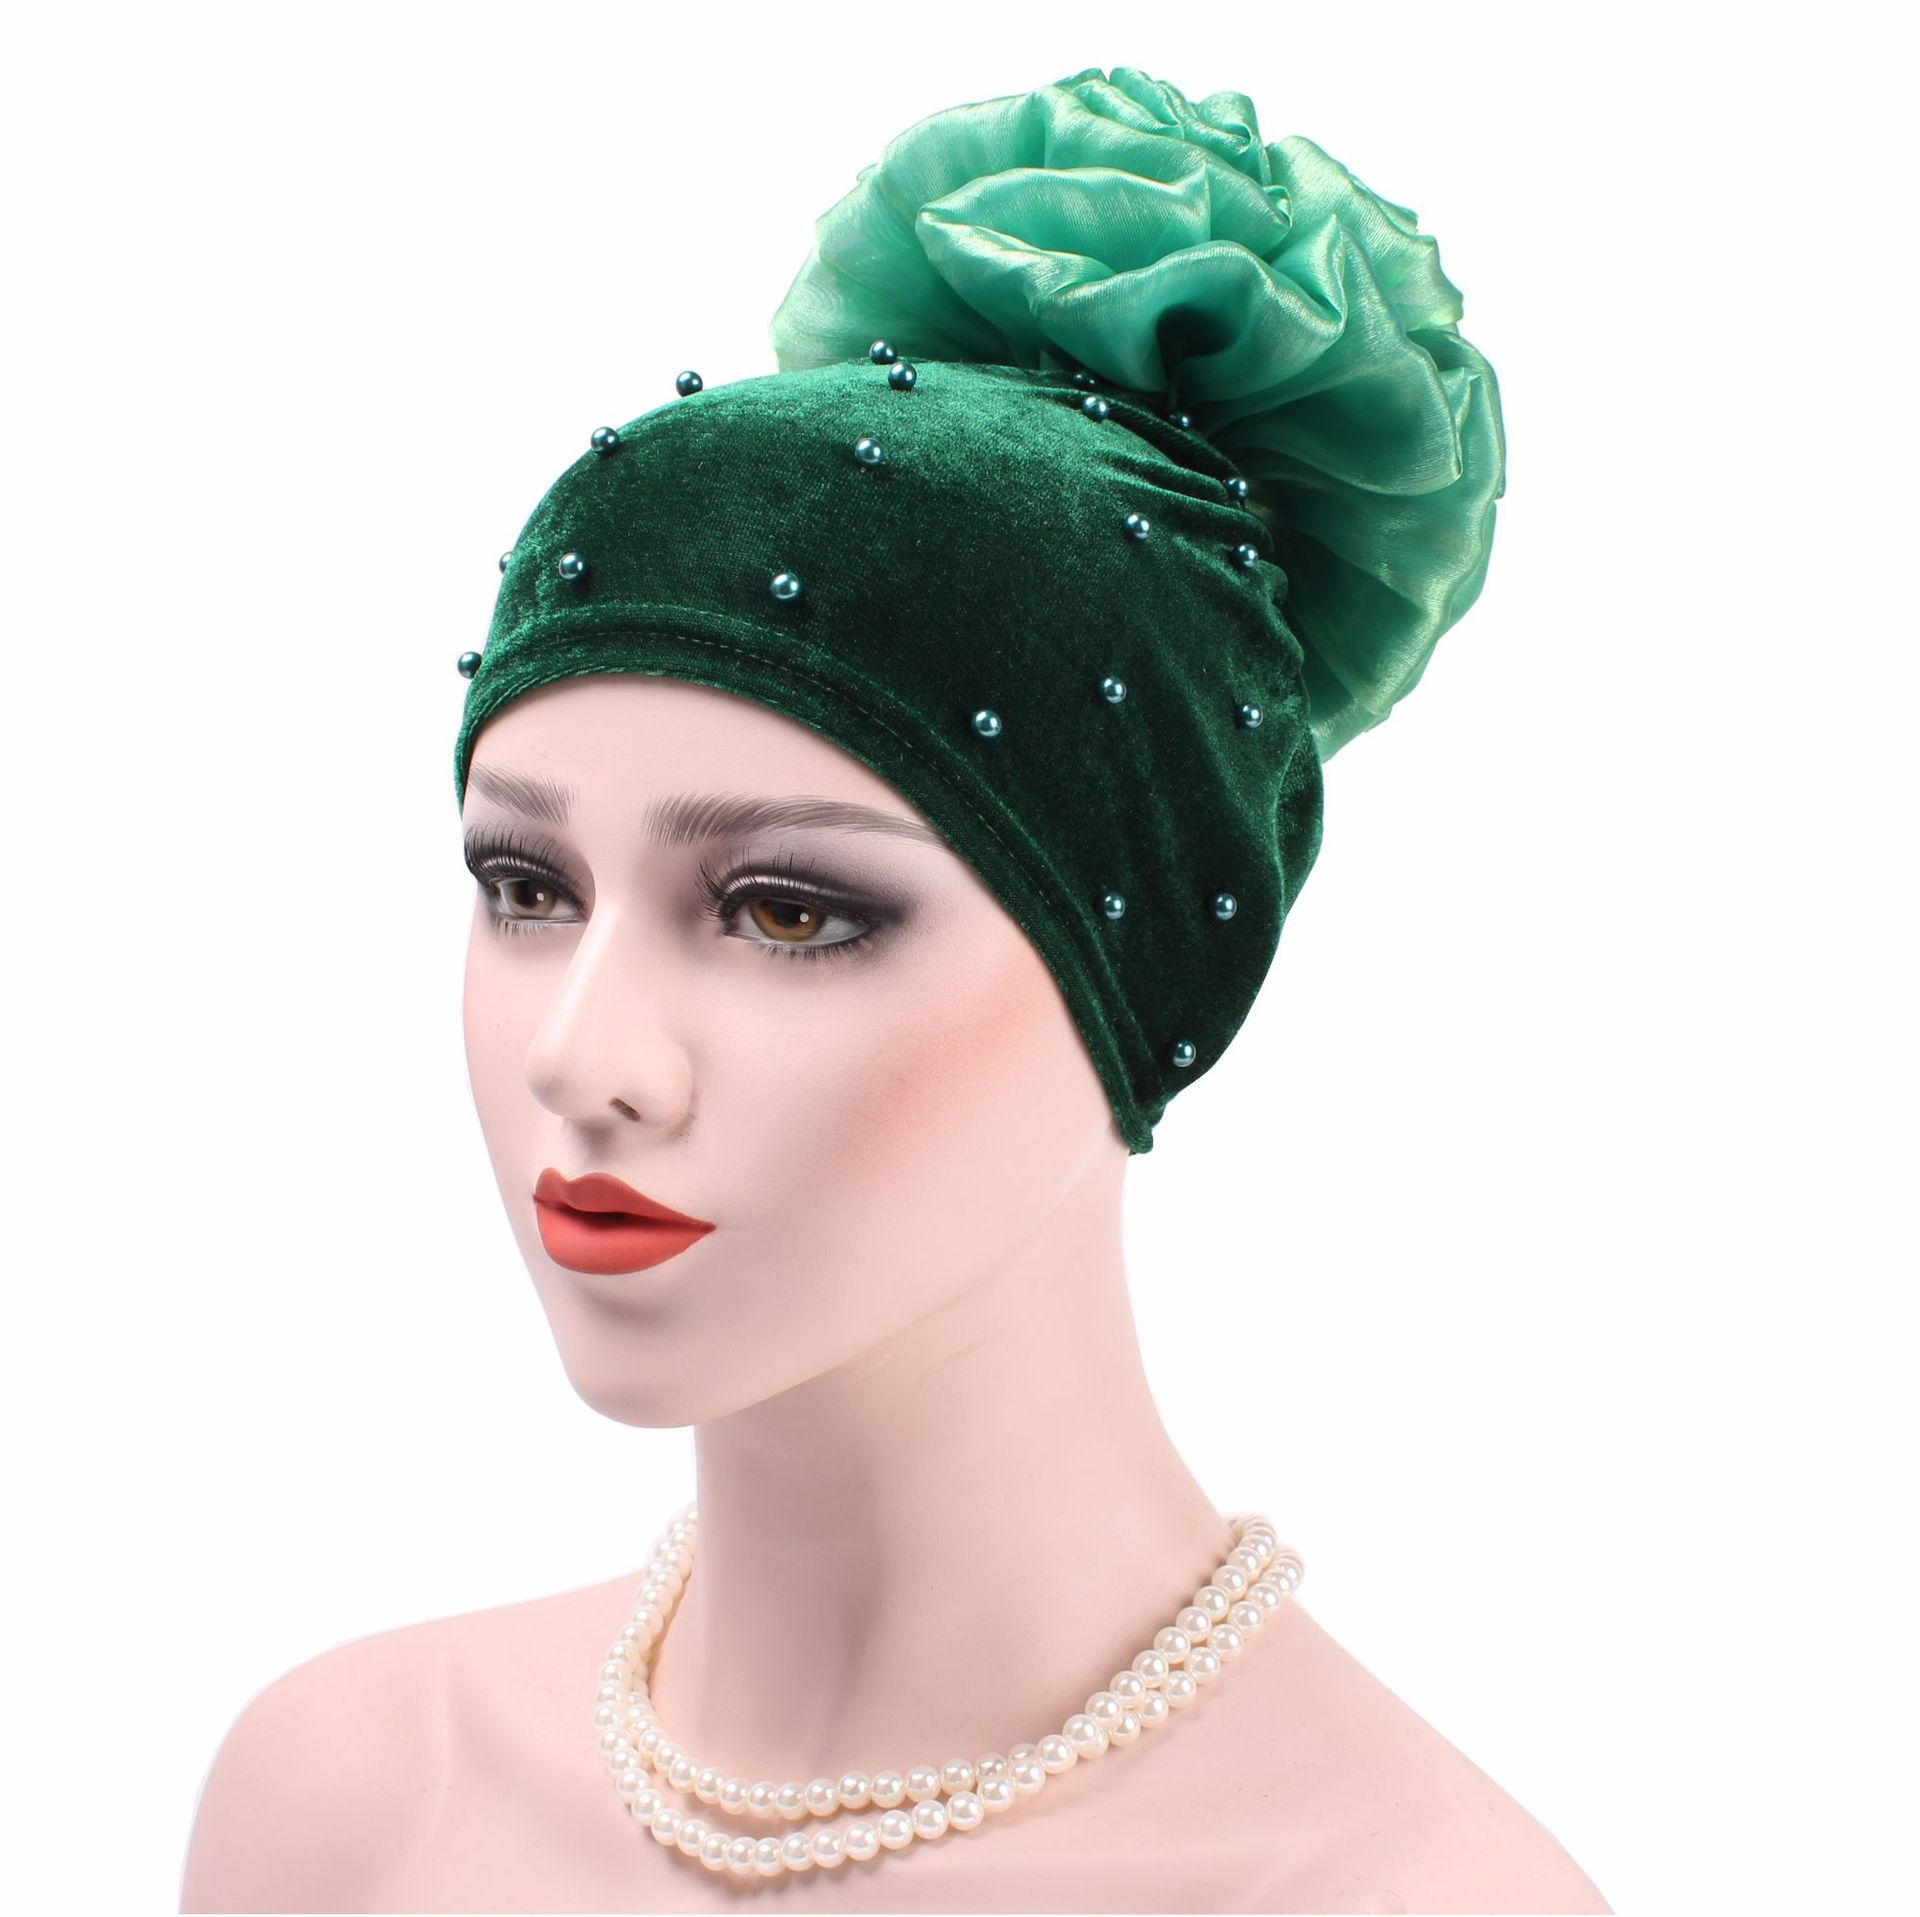 11 Patterns Velvet Beading Twist Flower Hats for Women Skullies Beanies Warm Stocking Hat Autumn Winter Caps Female Accessories